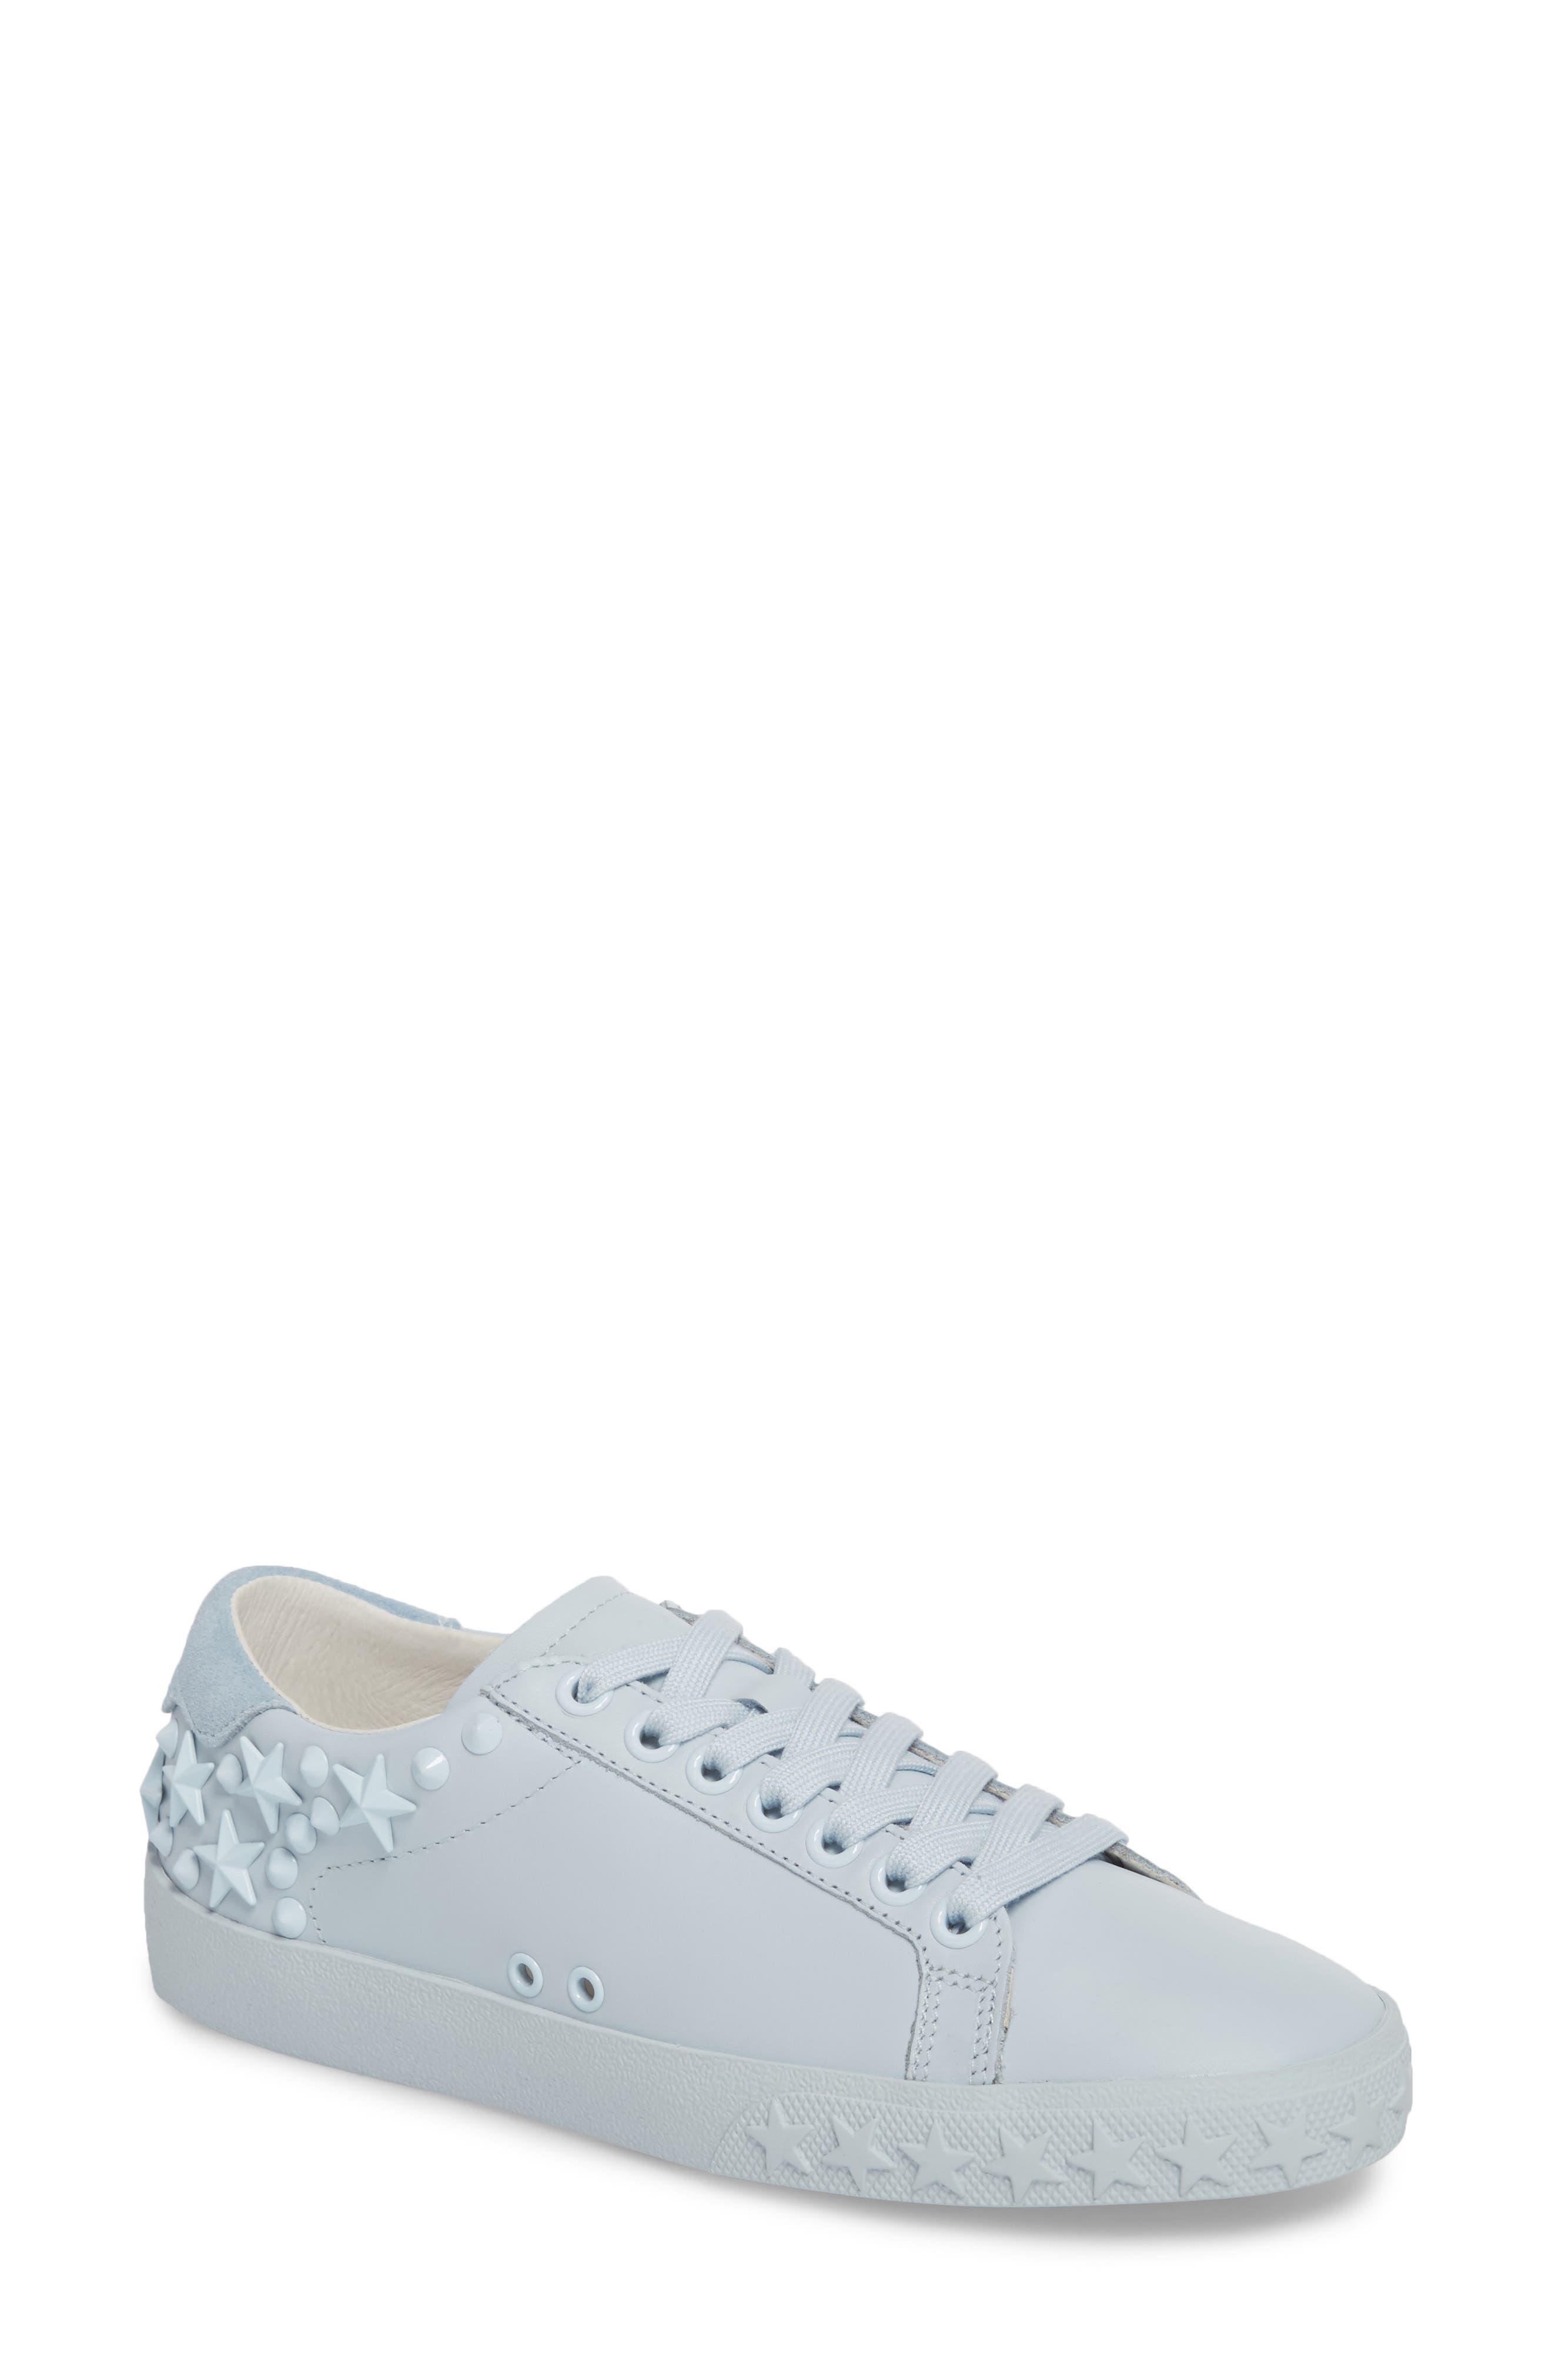 Dazed Sneaker,                         Main,                         color, Ice Blue